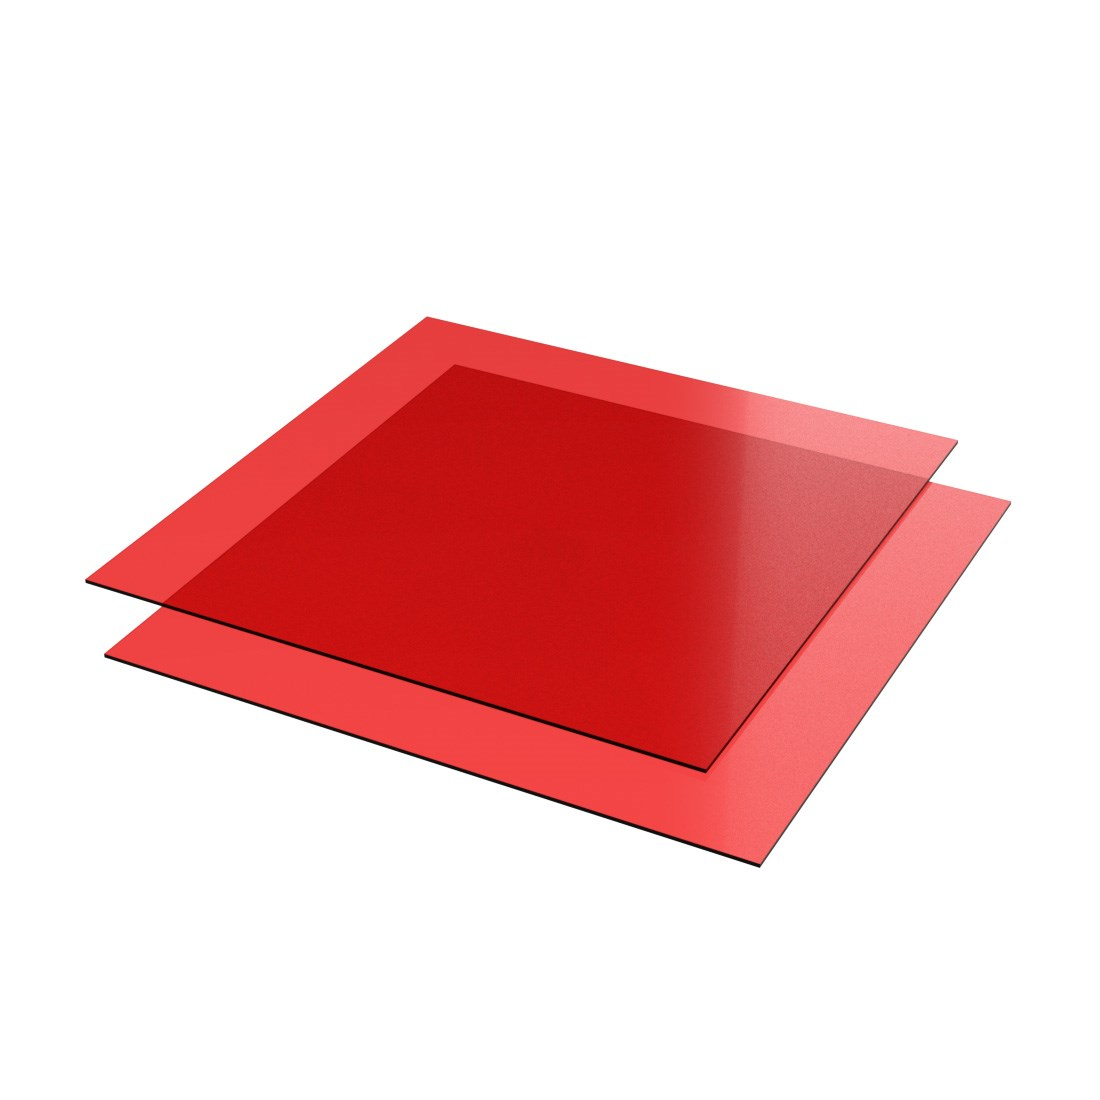 Vikunyl PVC Rood transparant 0484 Glans 1400x1000x0,23mm